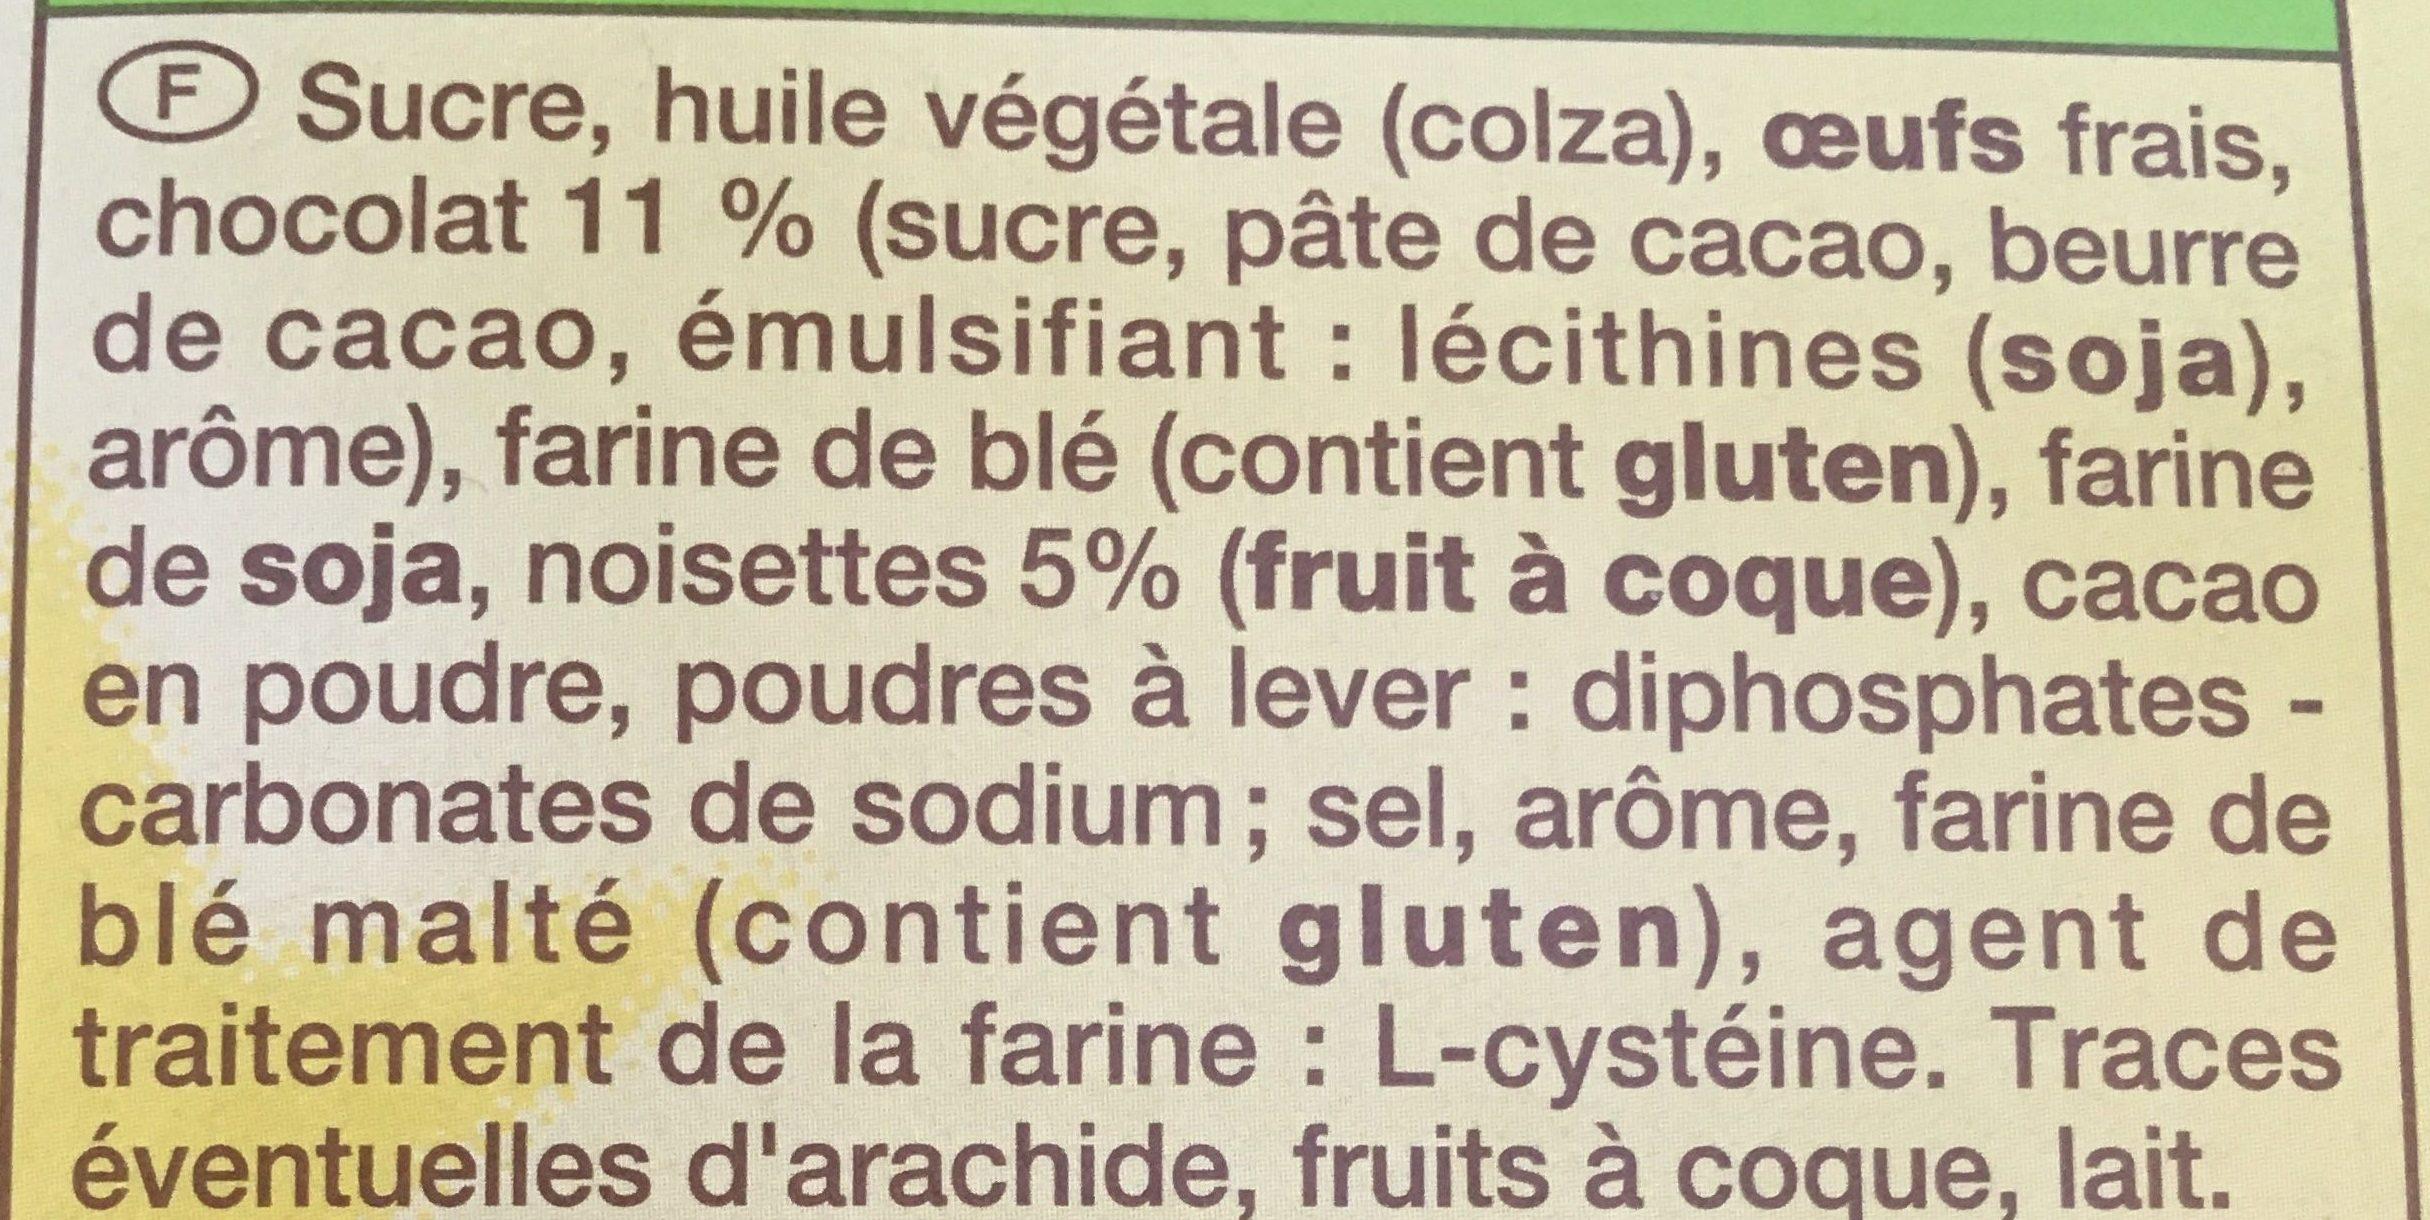 Brownie chocolat noisettes - Ingrédients - fr